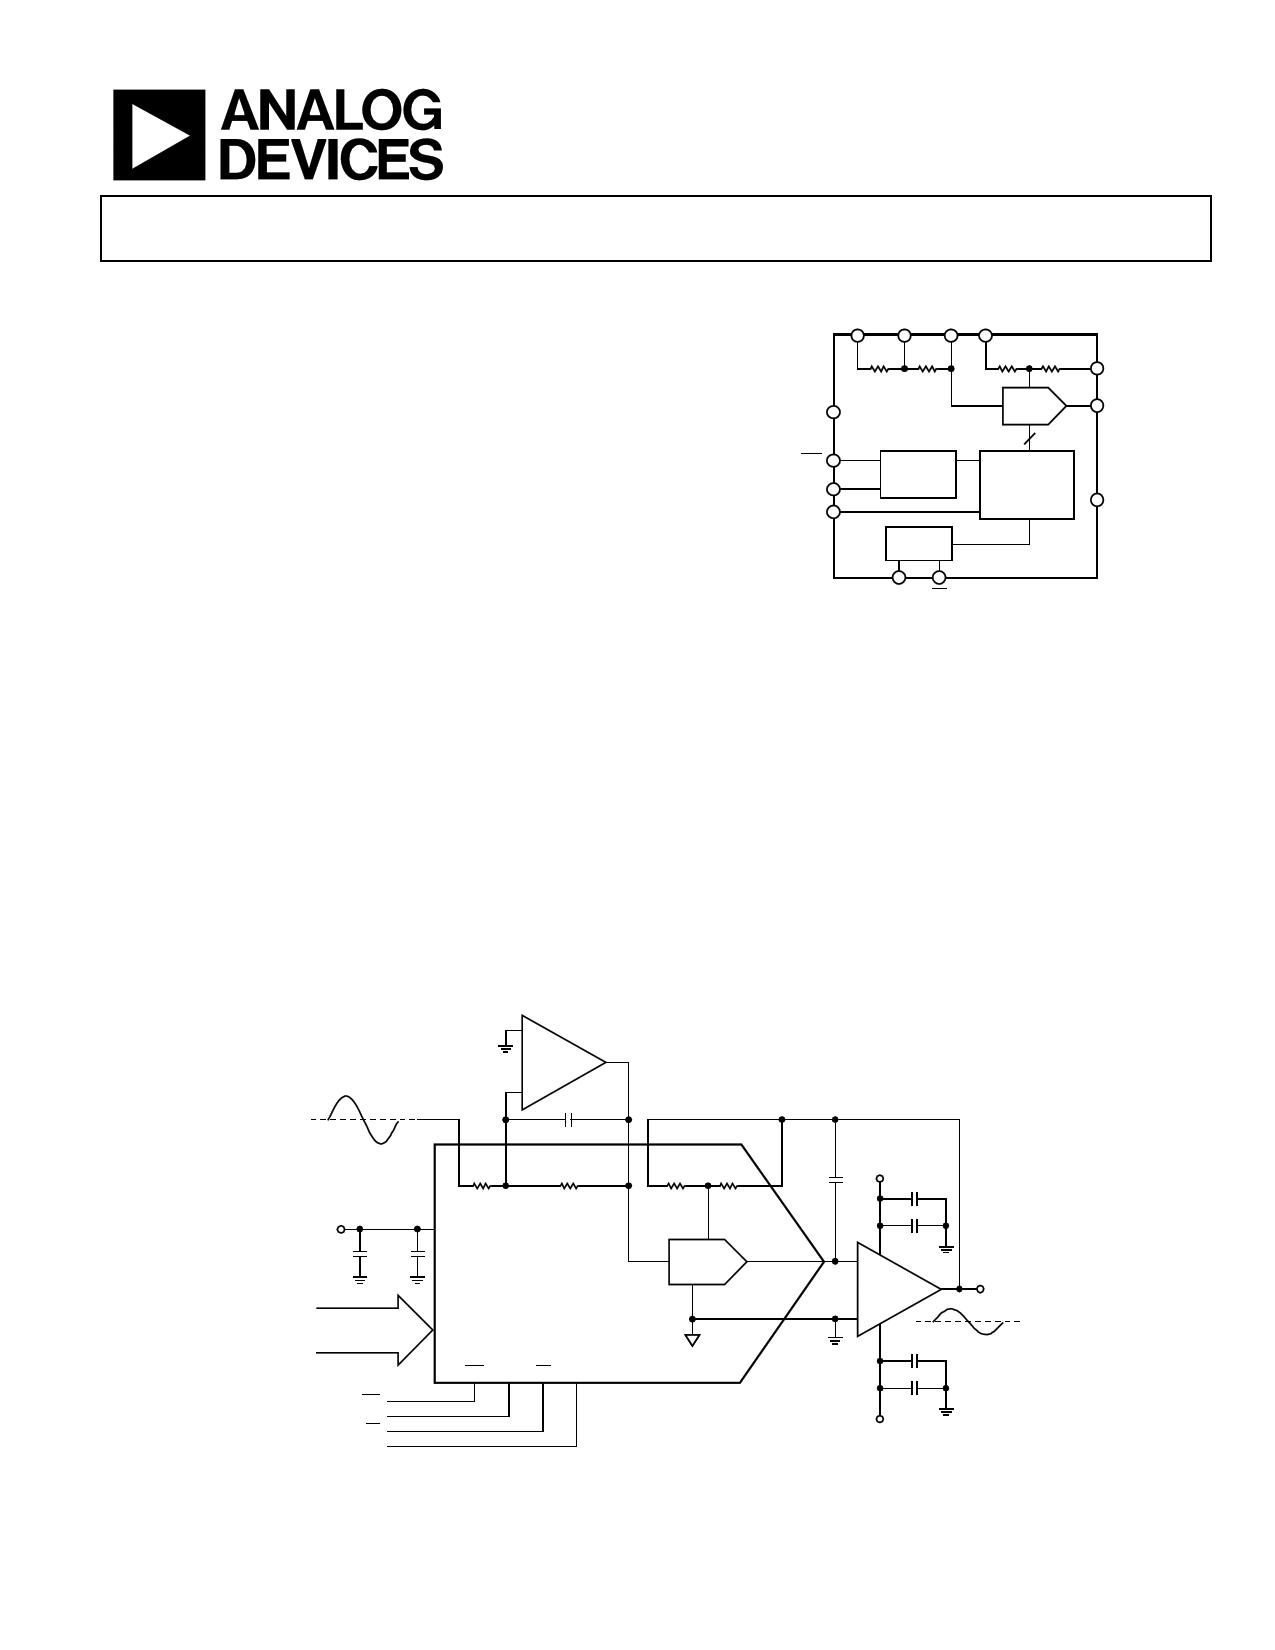 AD5546 datasheet